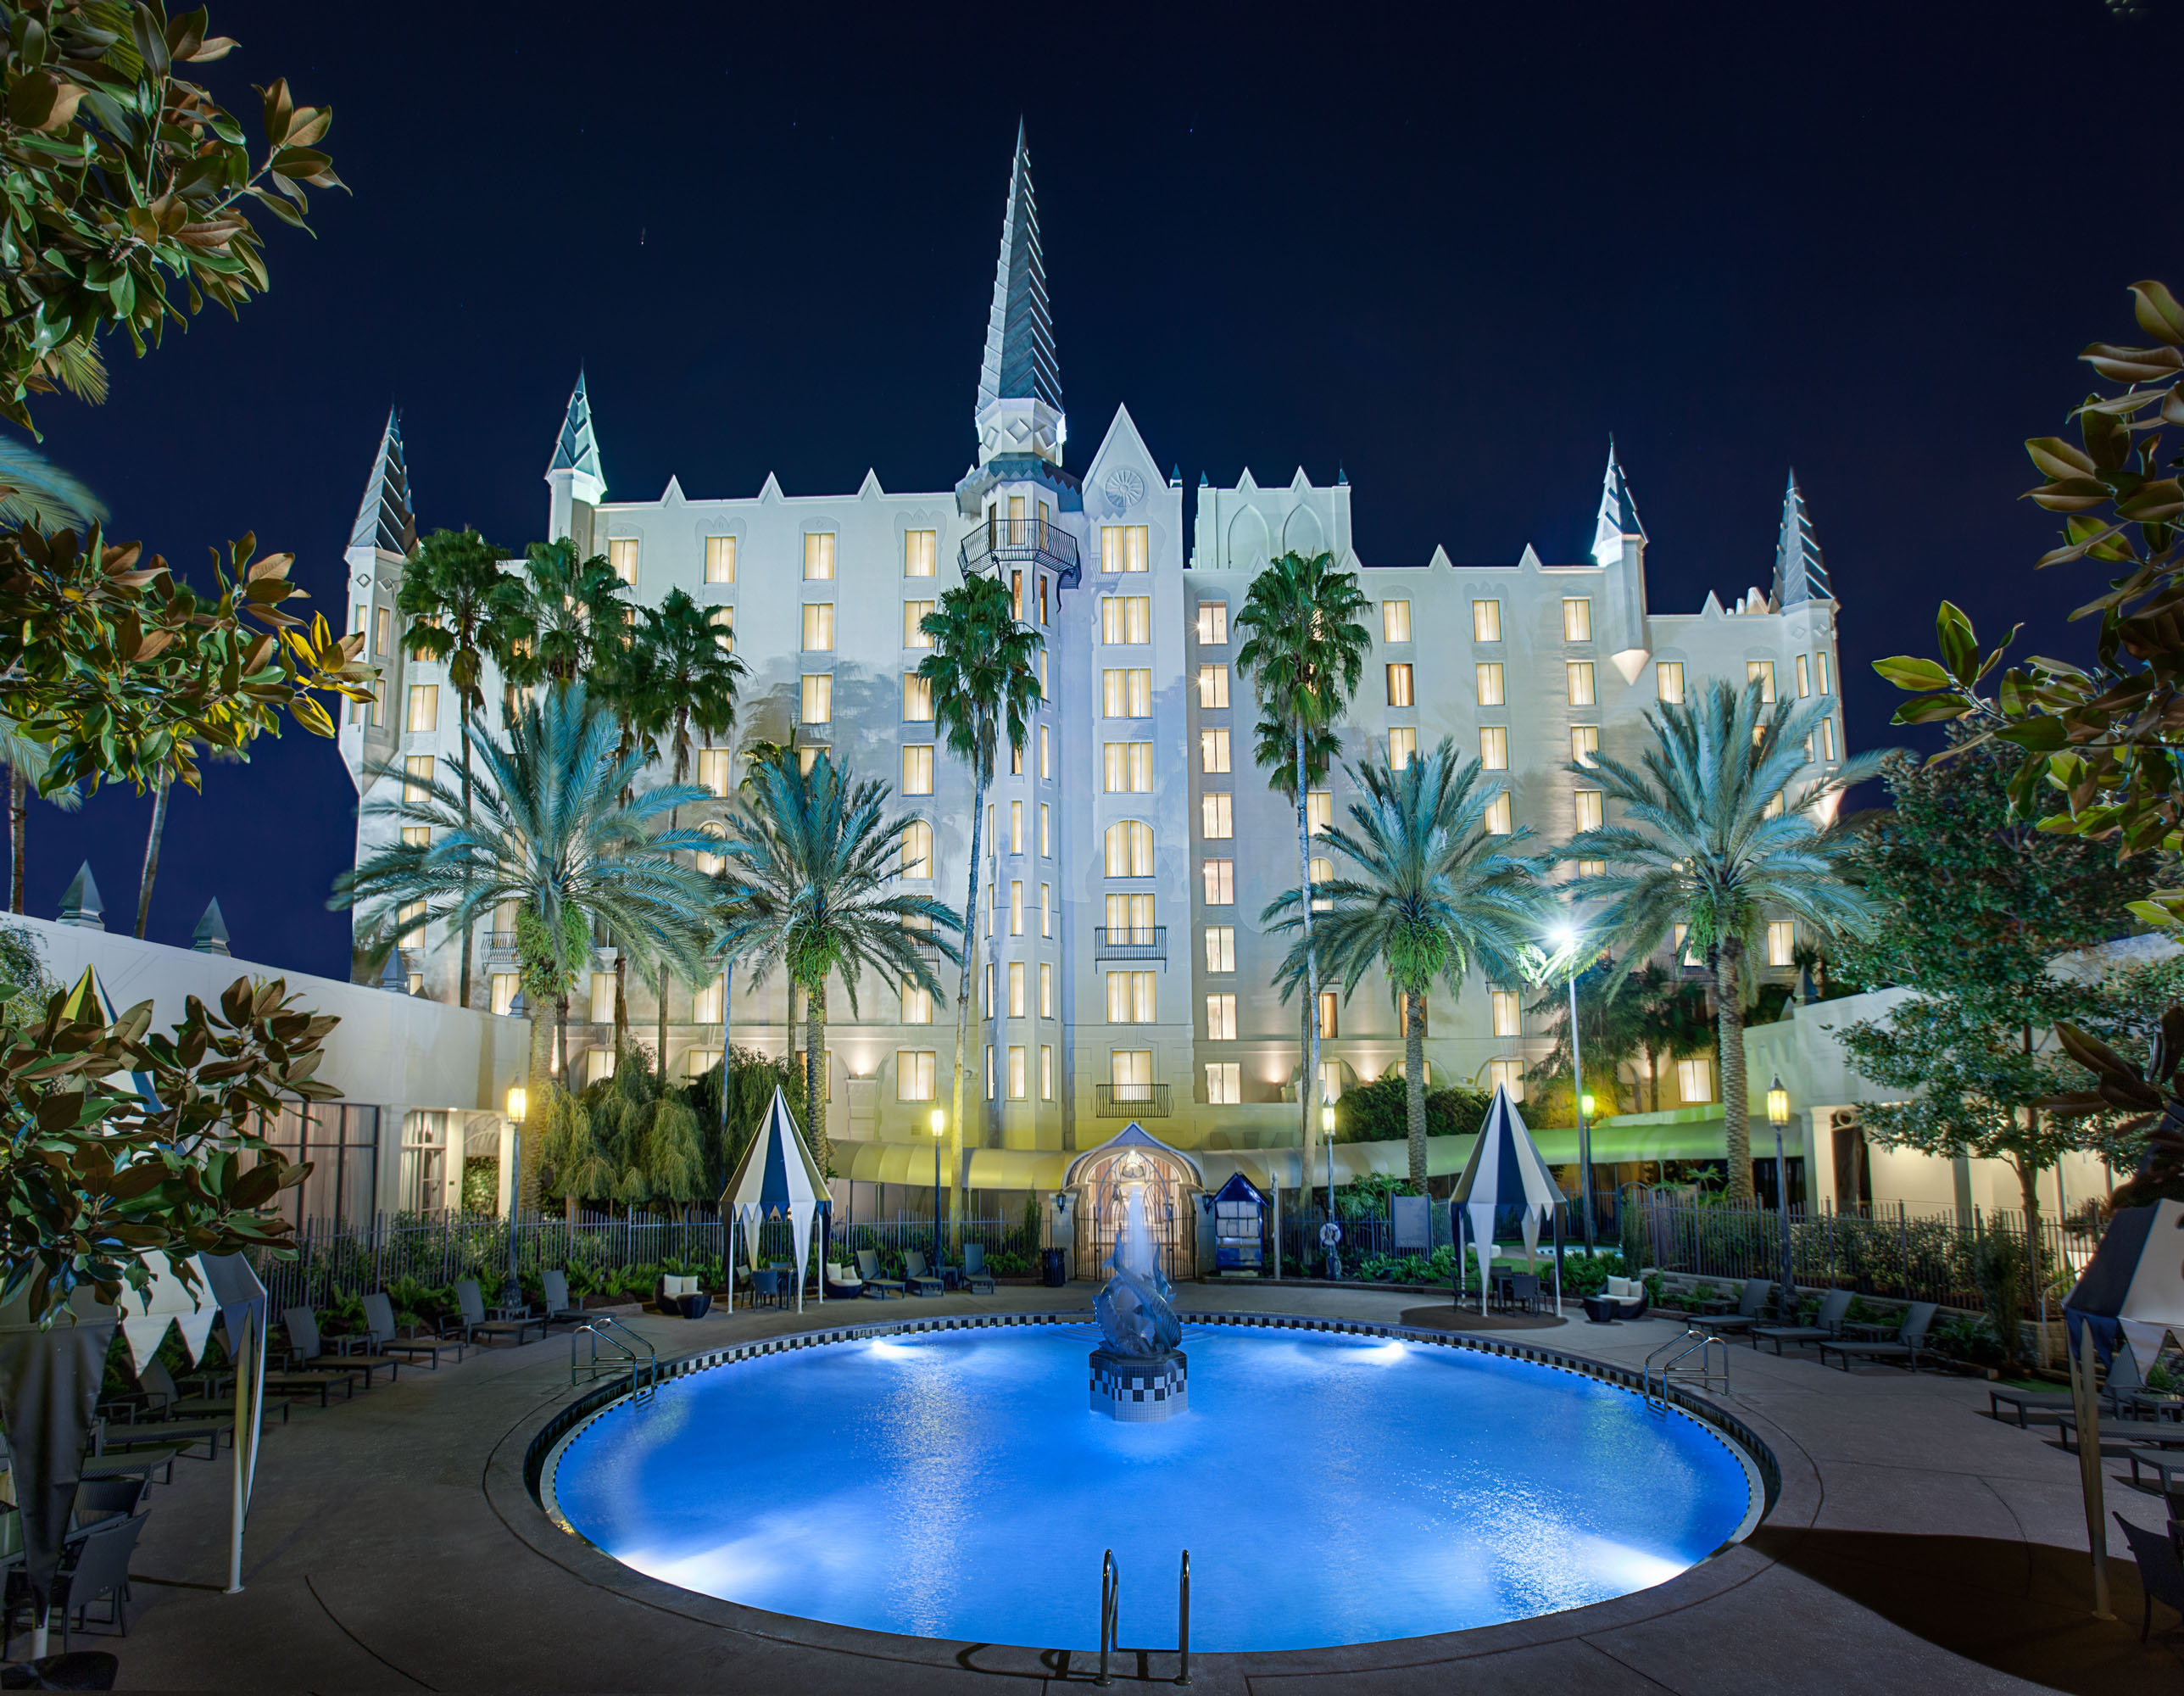 Hotel Castle Blue Castle Hotel Dresses Up For Corporate Business Karen Kuzsel